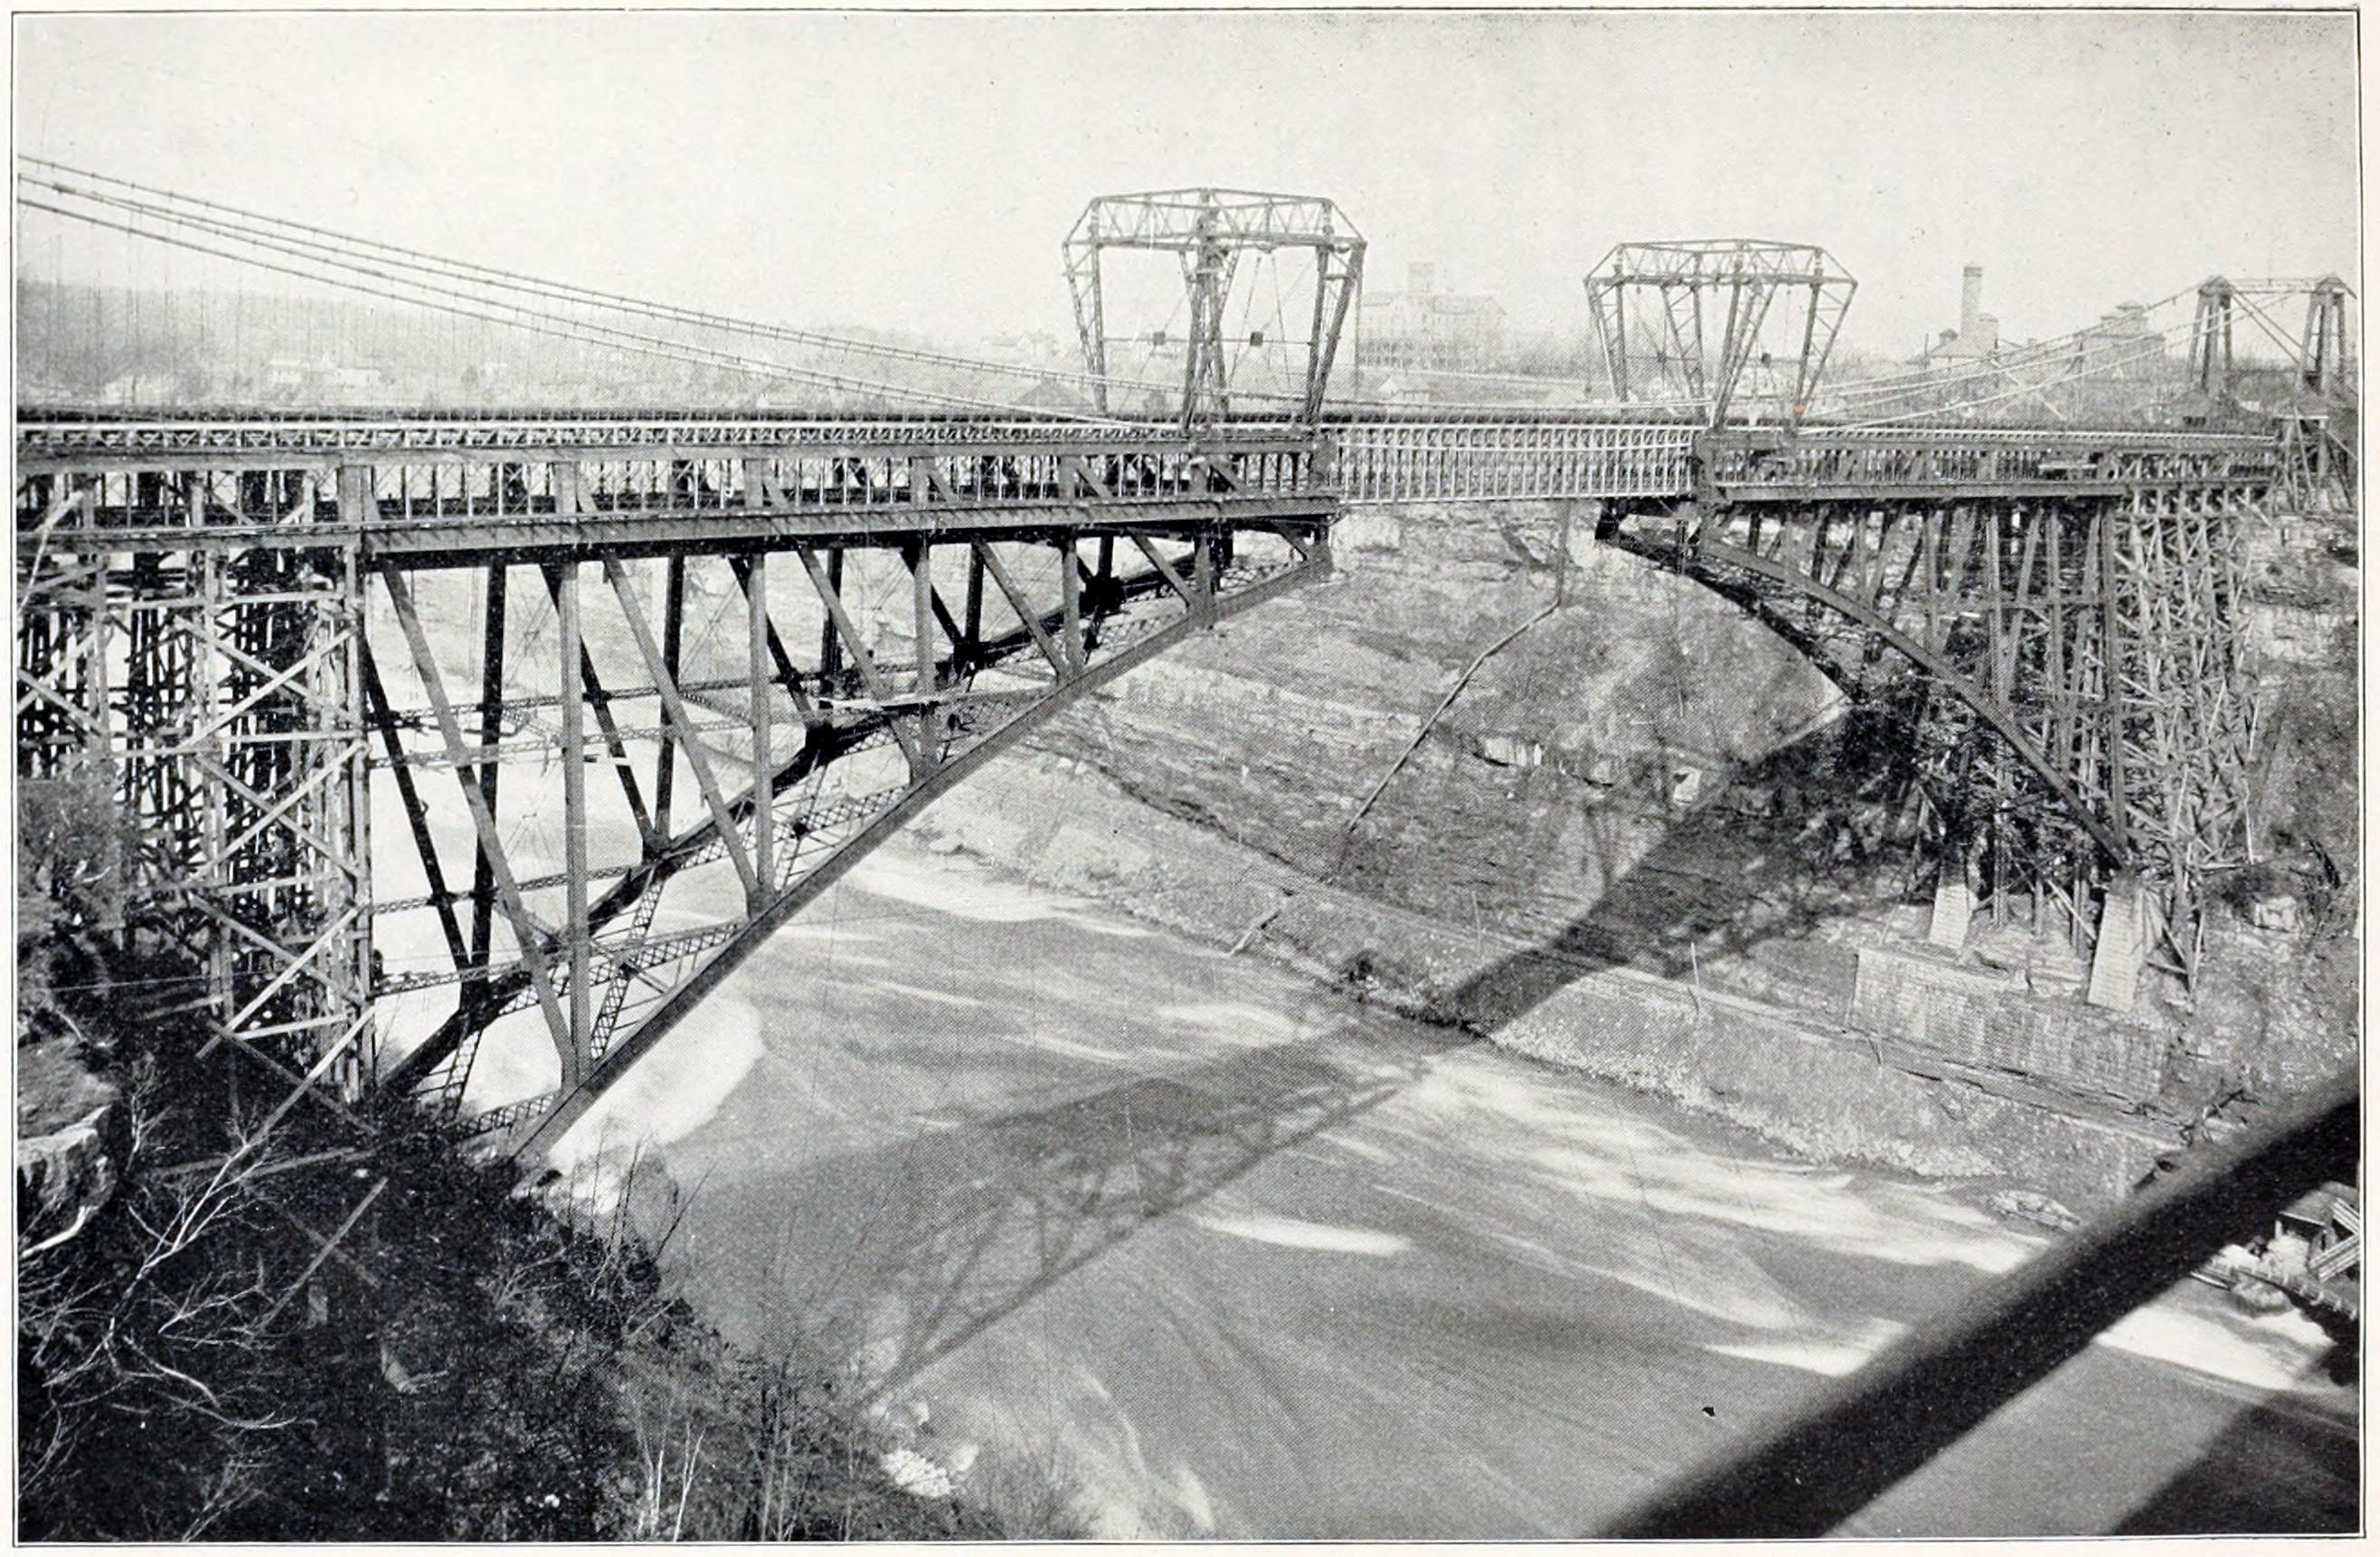 Whirlpool Black Ice Whirlpool Rapids Bridge Lower Arch Bridge